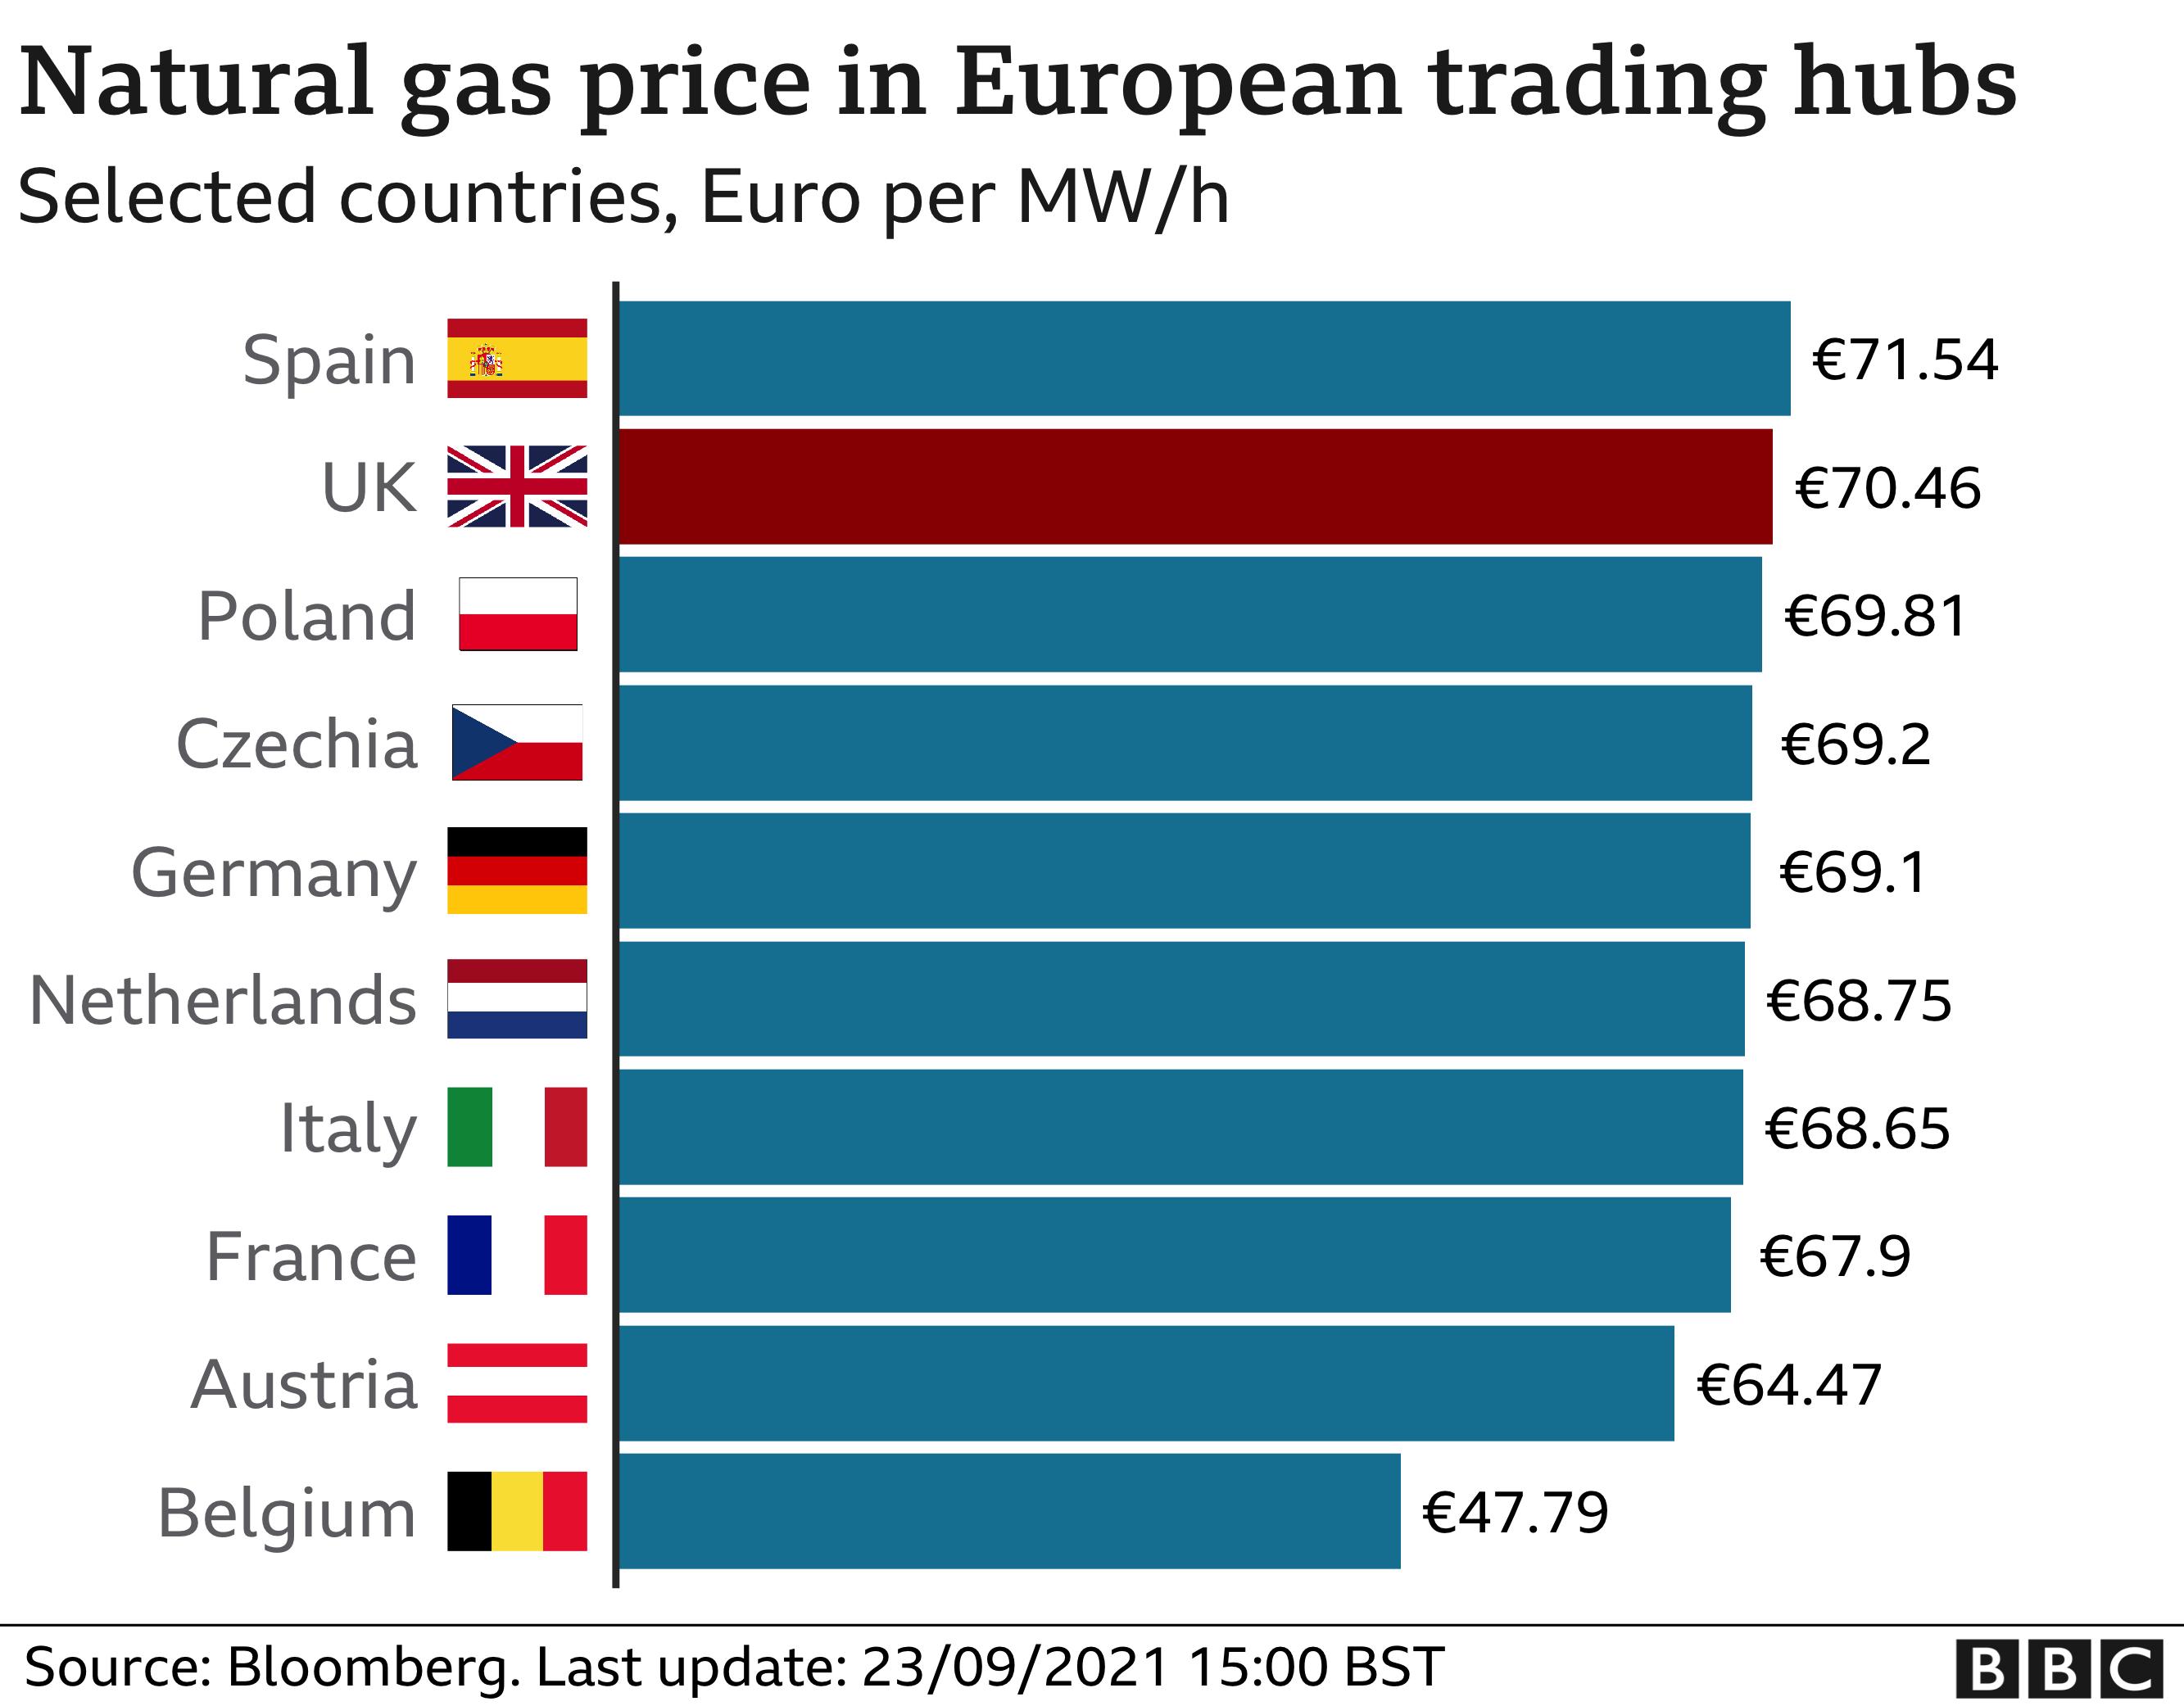 Natural gas prices in European trading hubs, 23 September